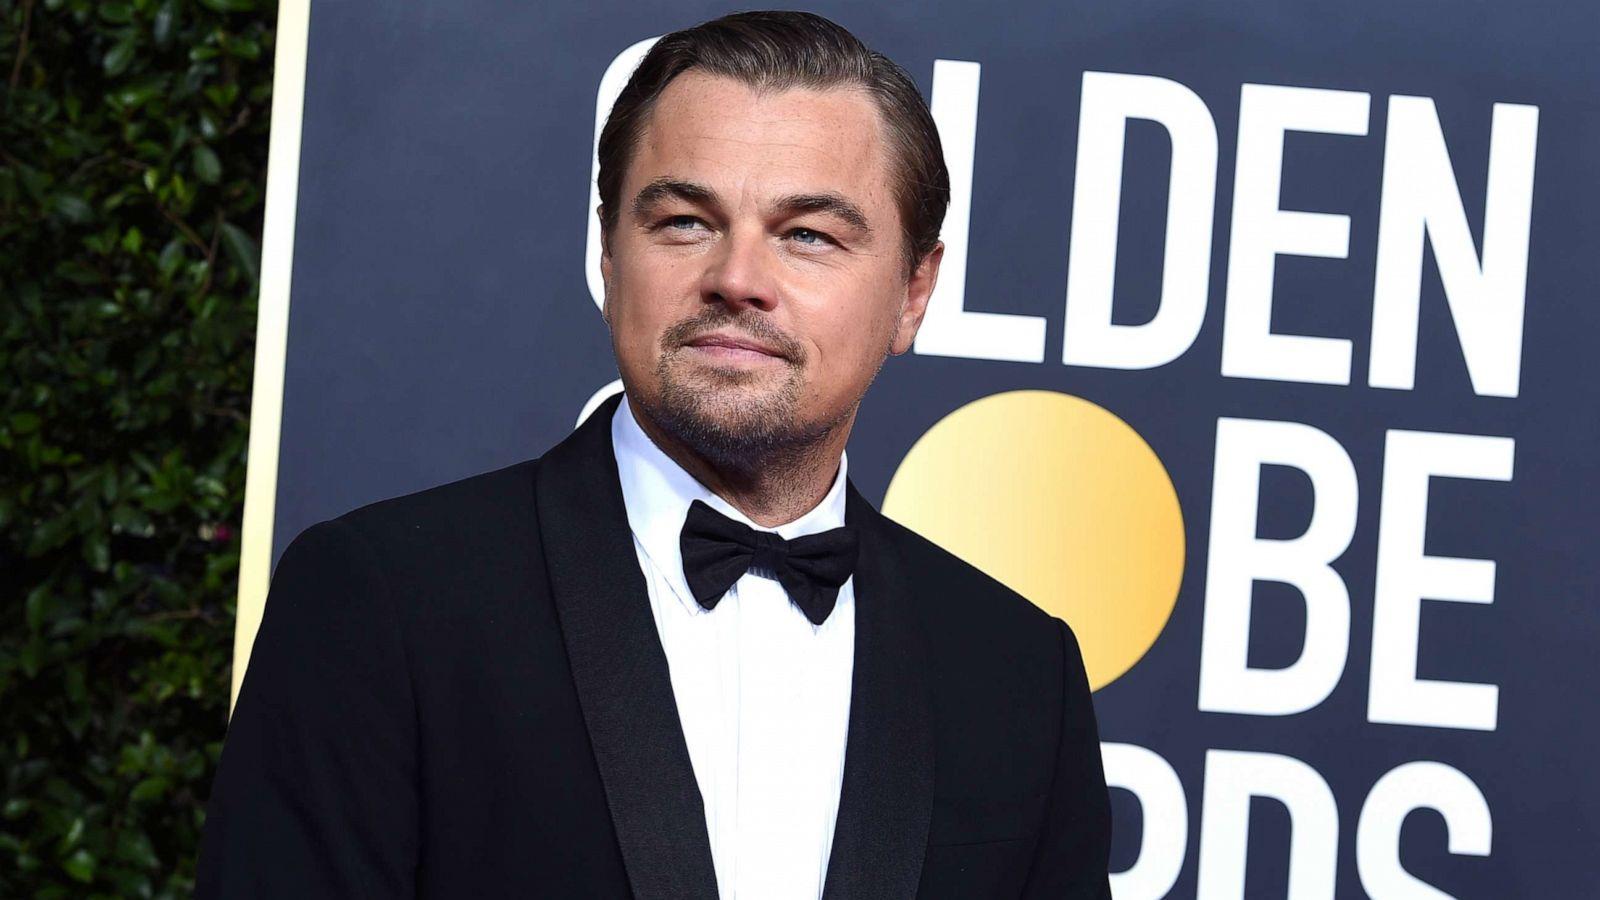 Leonardo Dicaprio S Organization Pledges 3 Million To Australia Images, Photos, Reviews